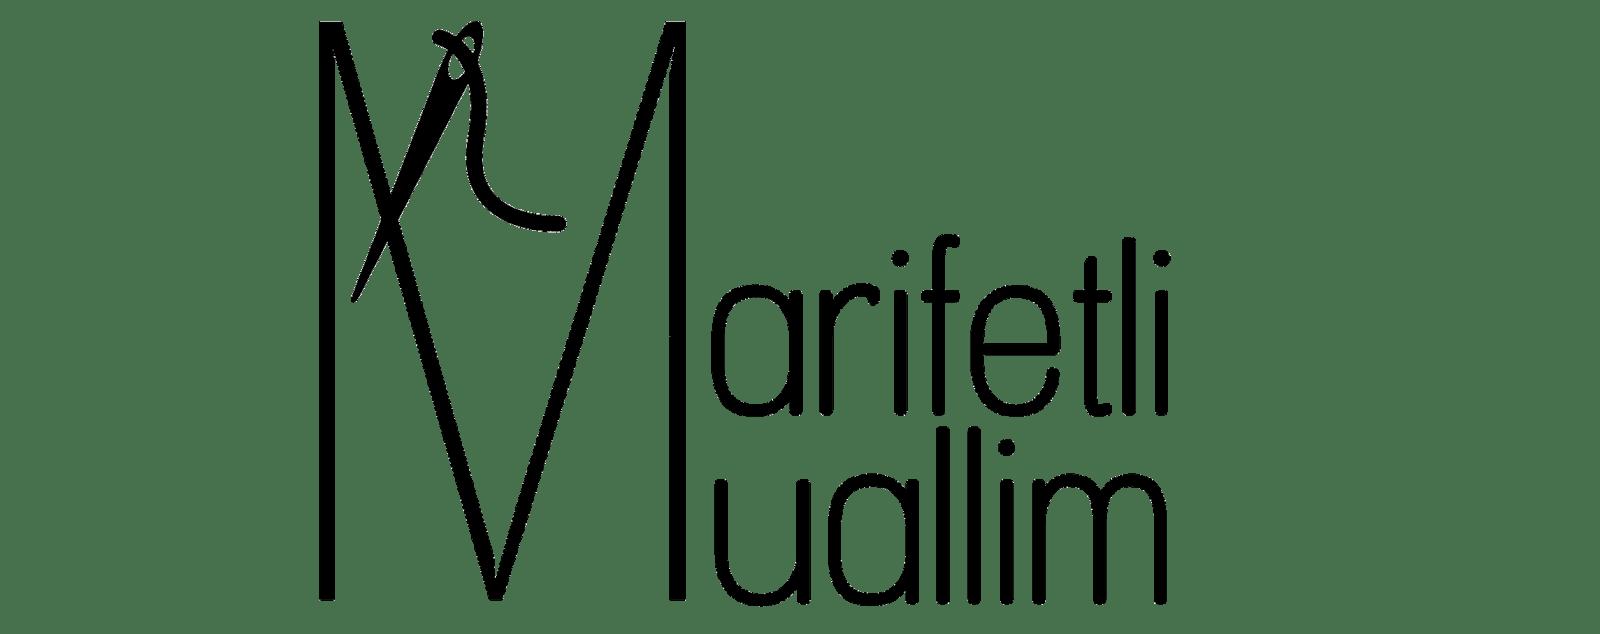 Marifetli Muallim